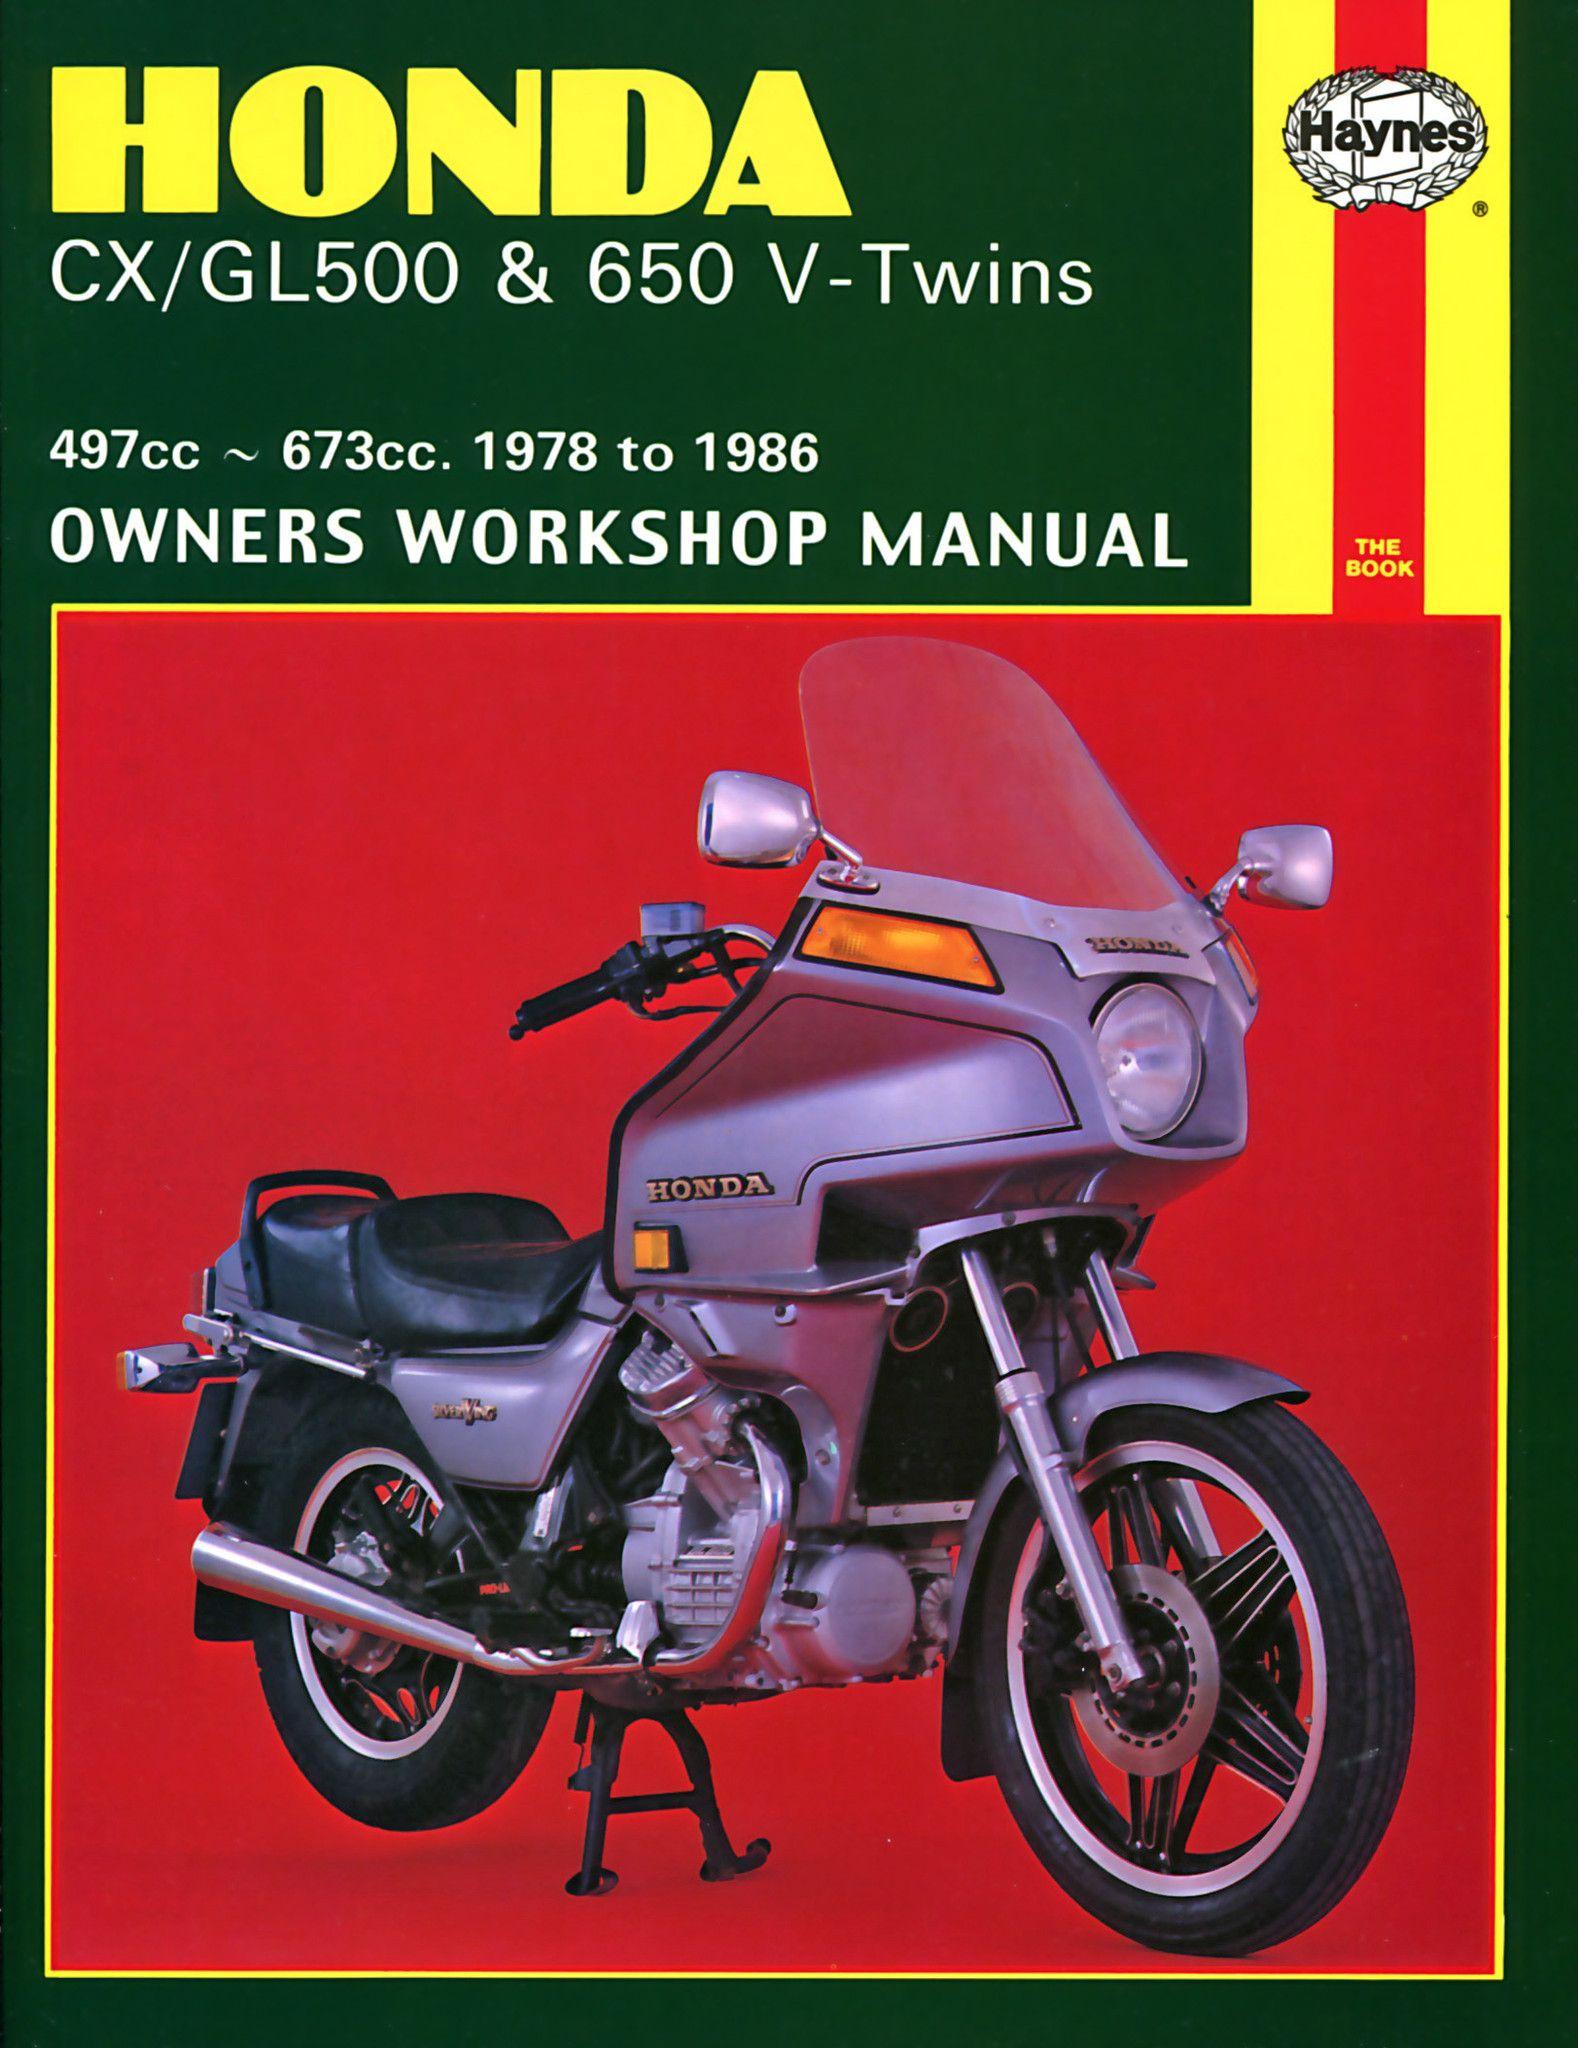 Haynes M442 Repair Manual for 1978-83 Honda CX/GL500,650 V-Twins 497cc, and  673cc